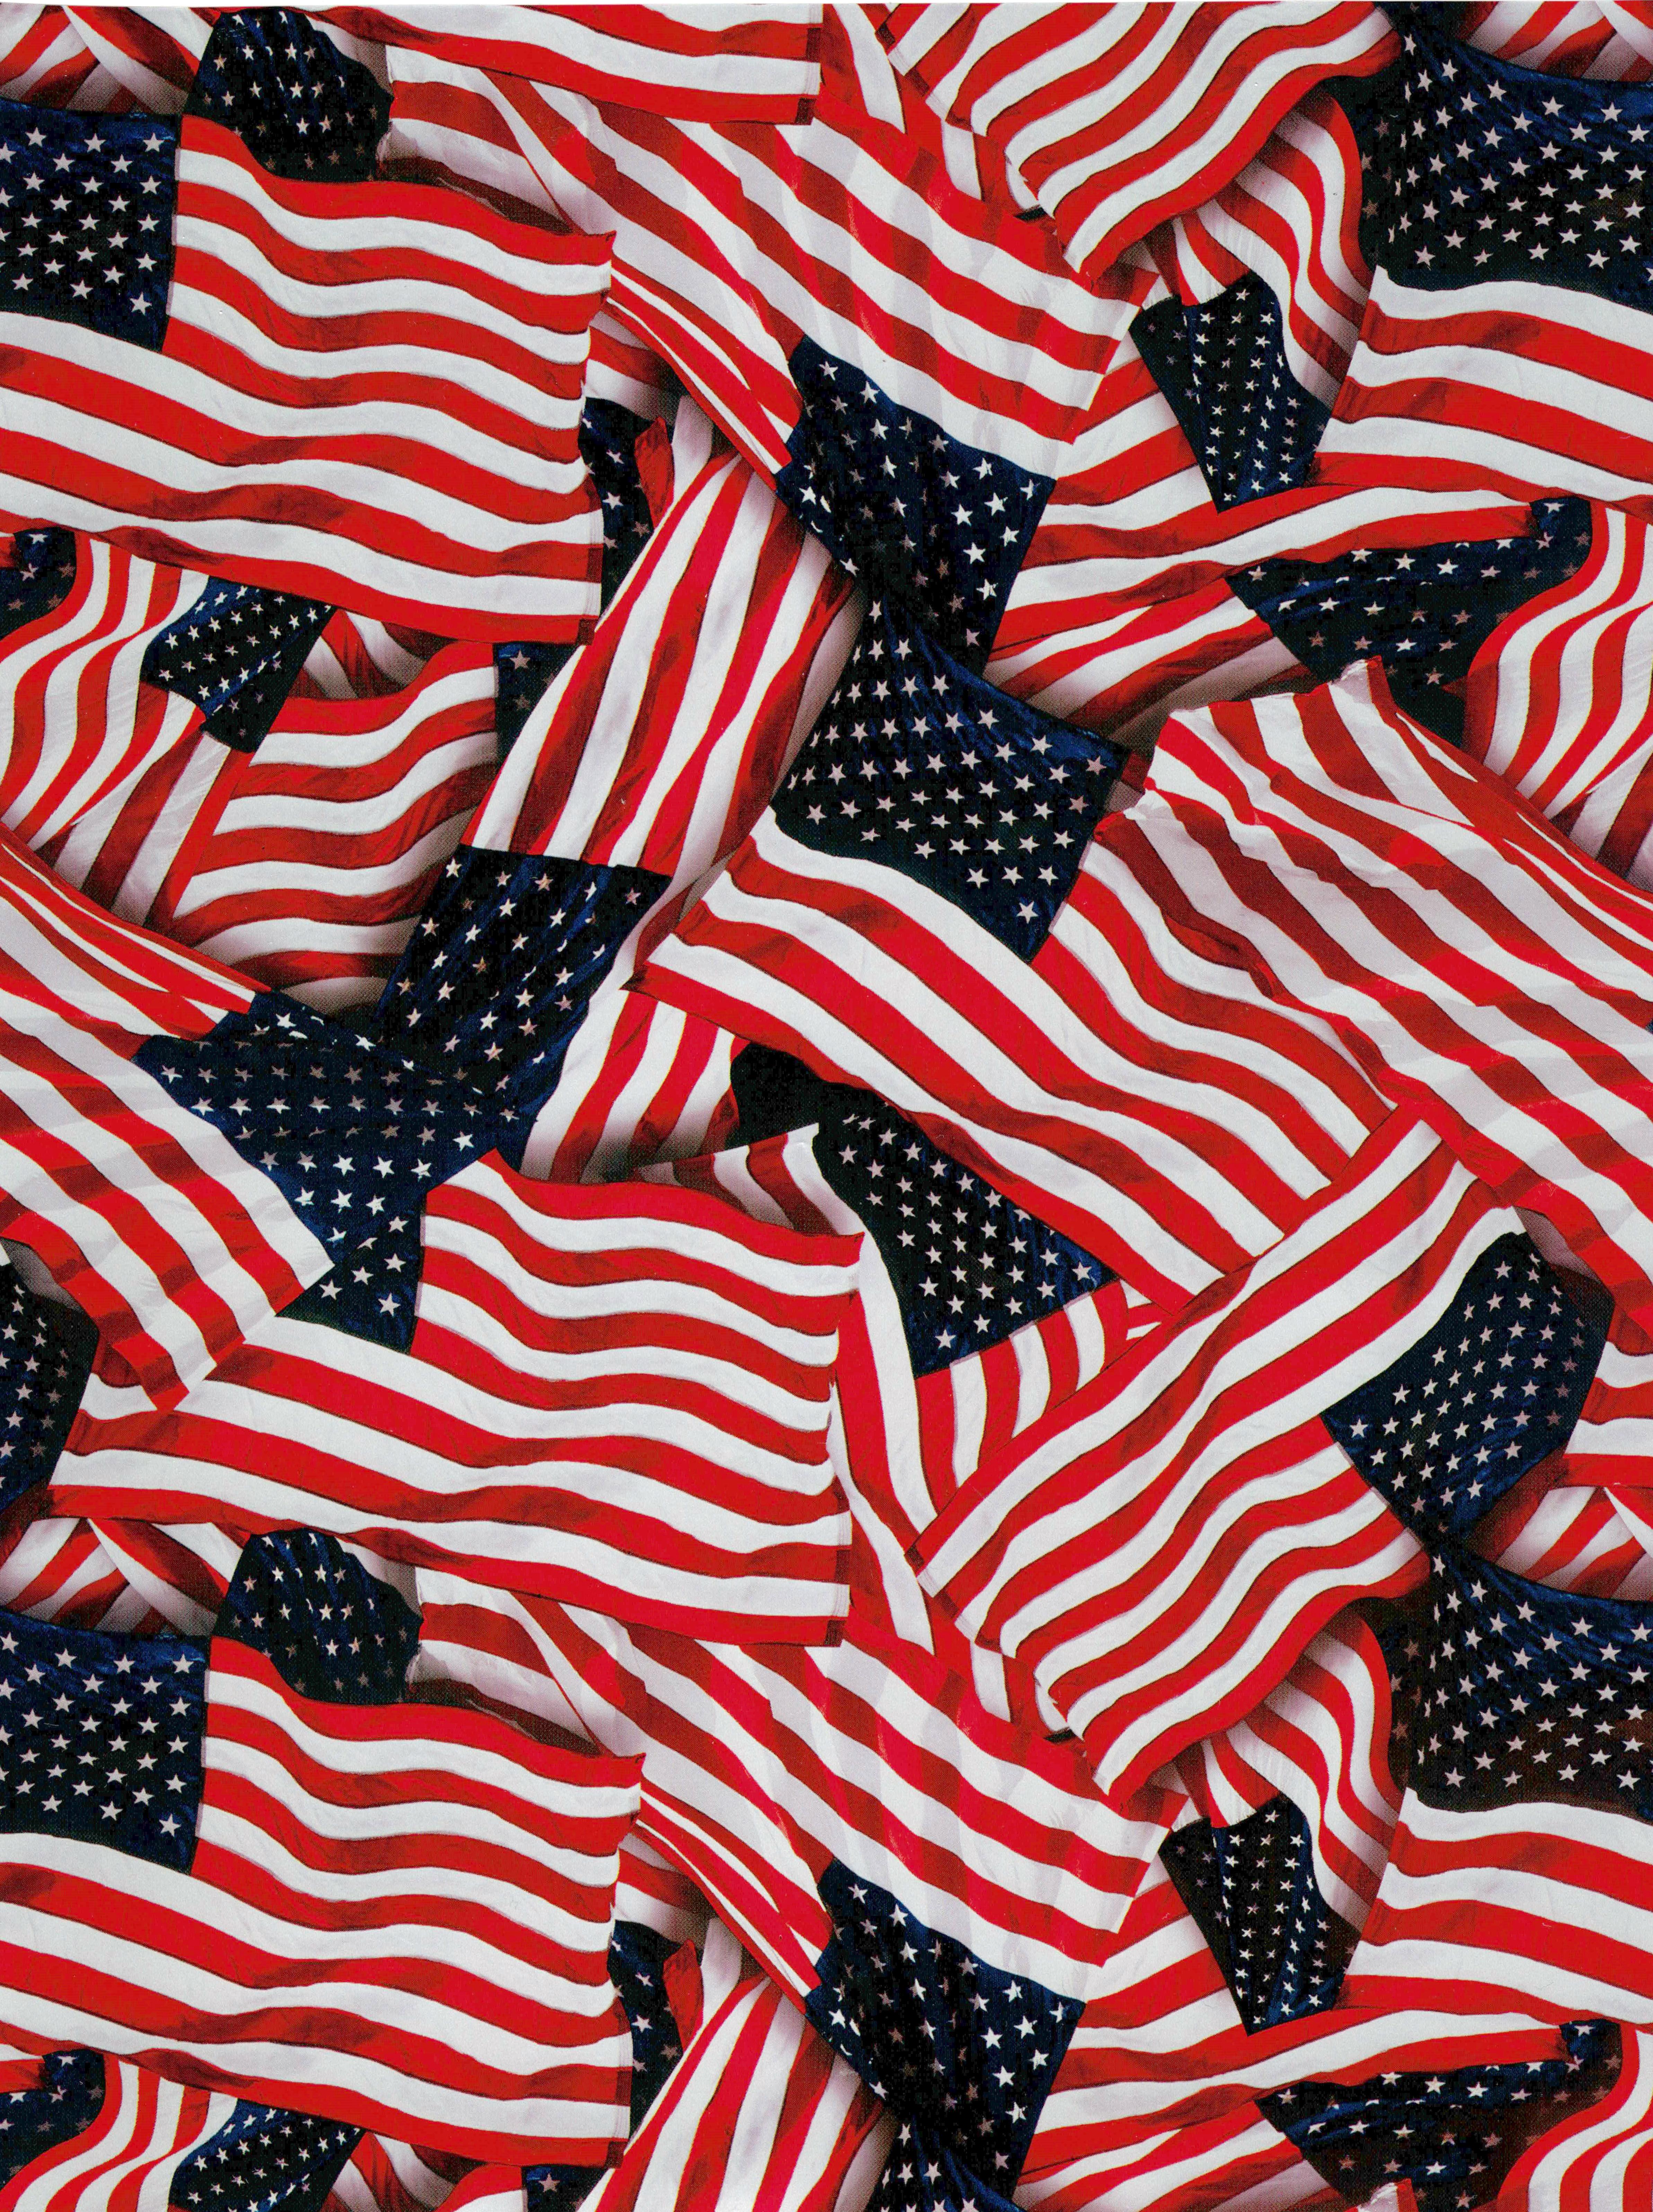 AmericanLiberty